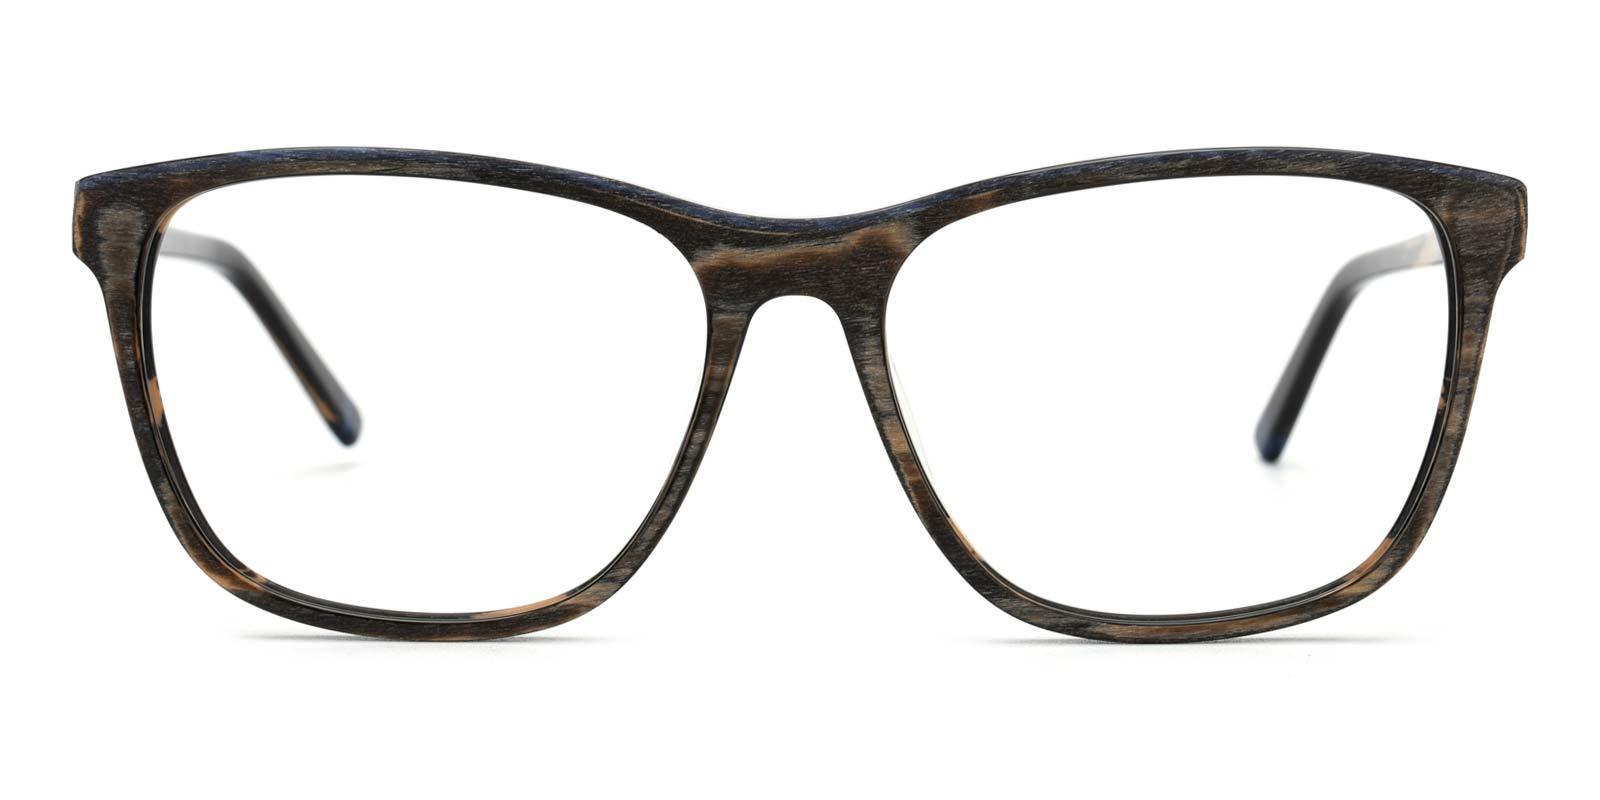 Hazelnut-Striped-Rectangle-Acetate-Eyeglasses-detail